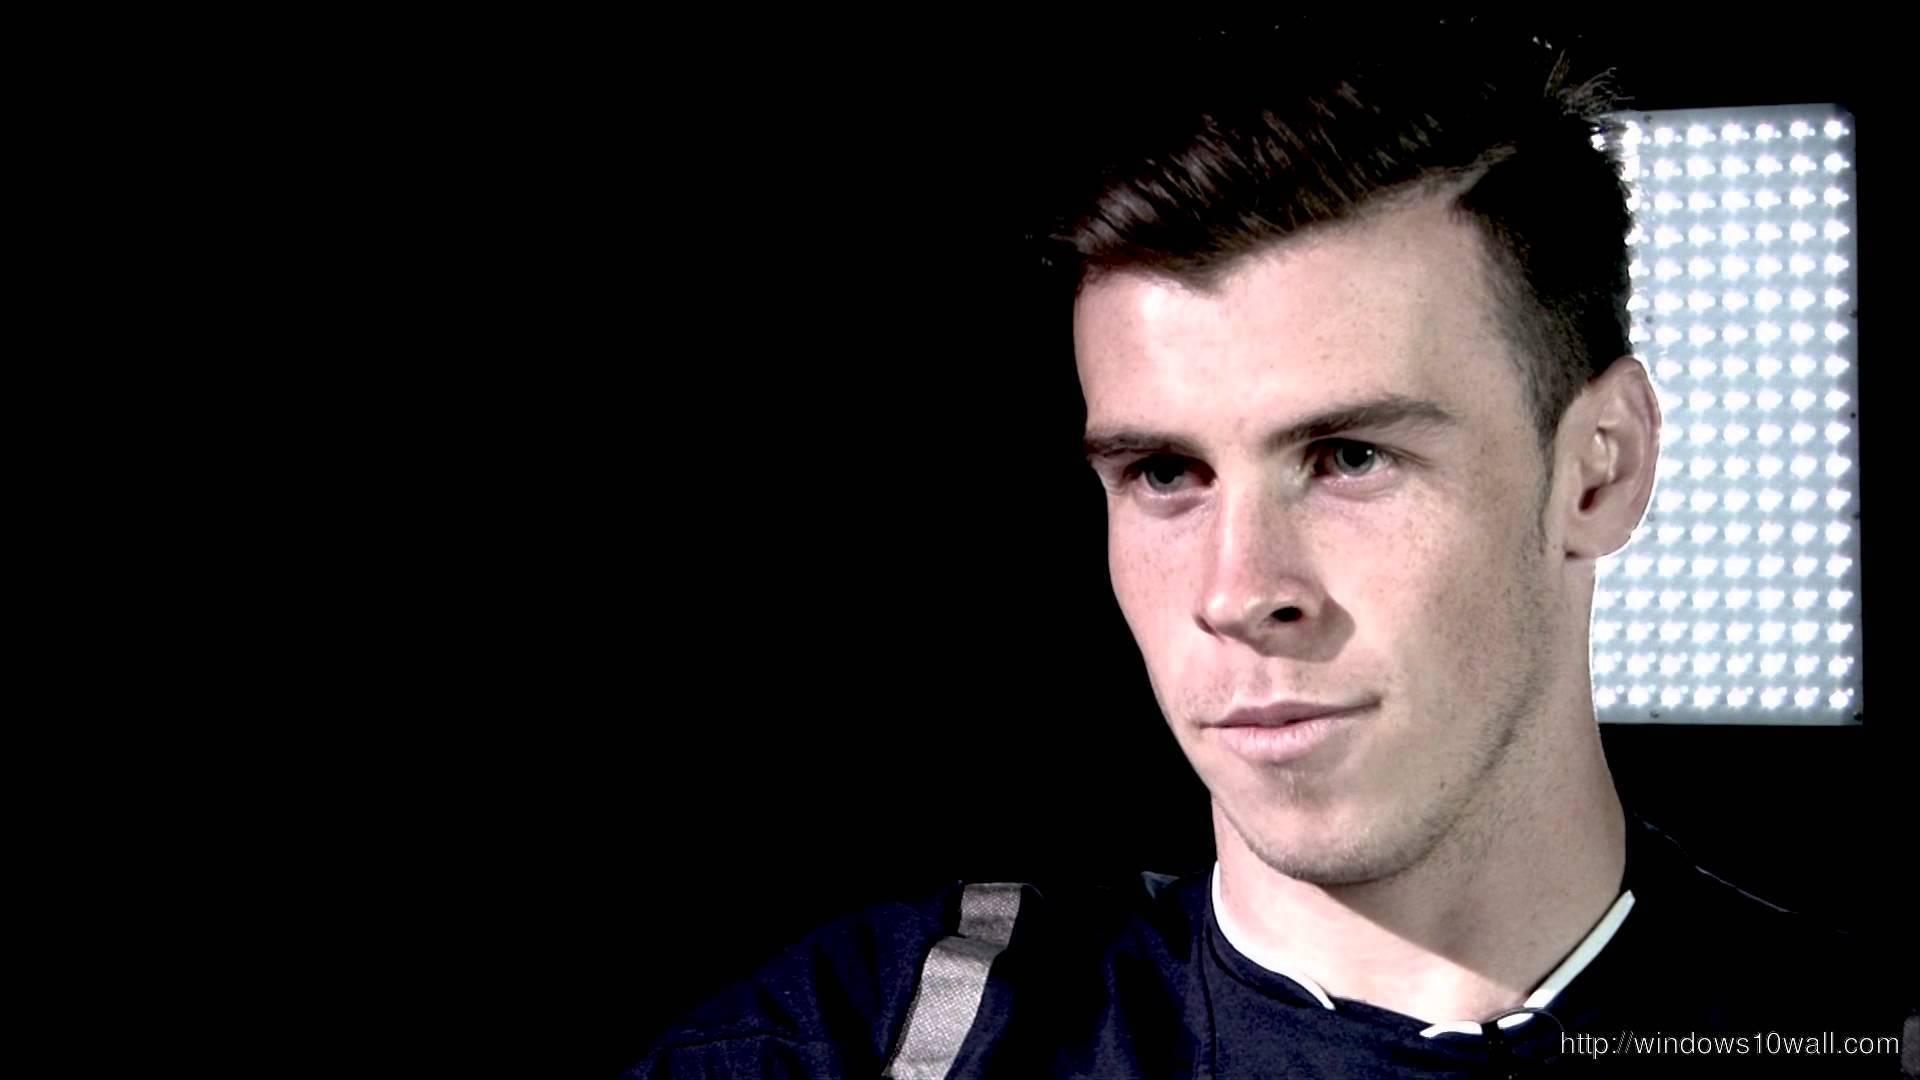 Gareth Bale in Black Background Wallpaper